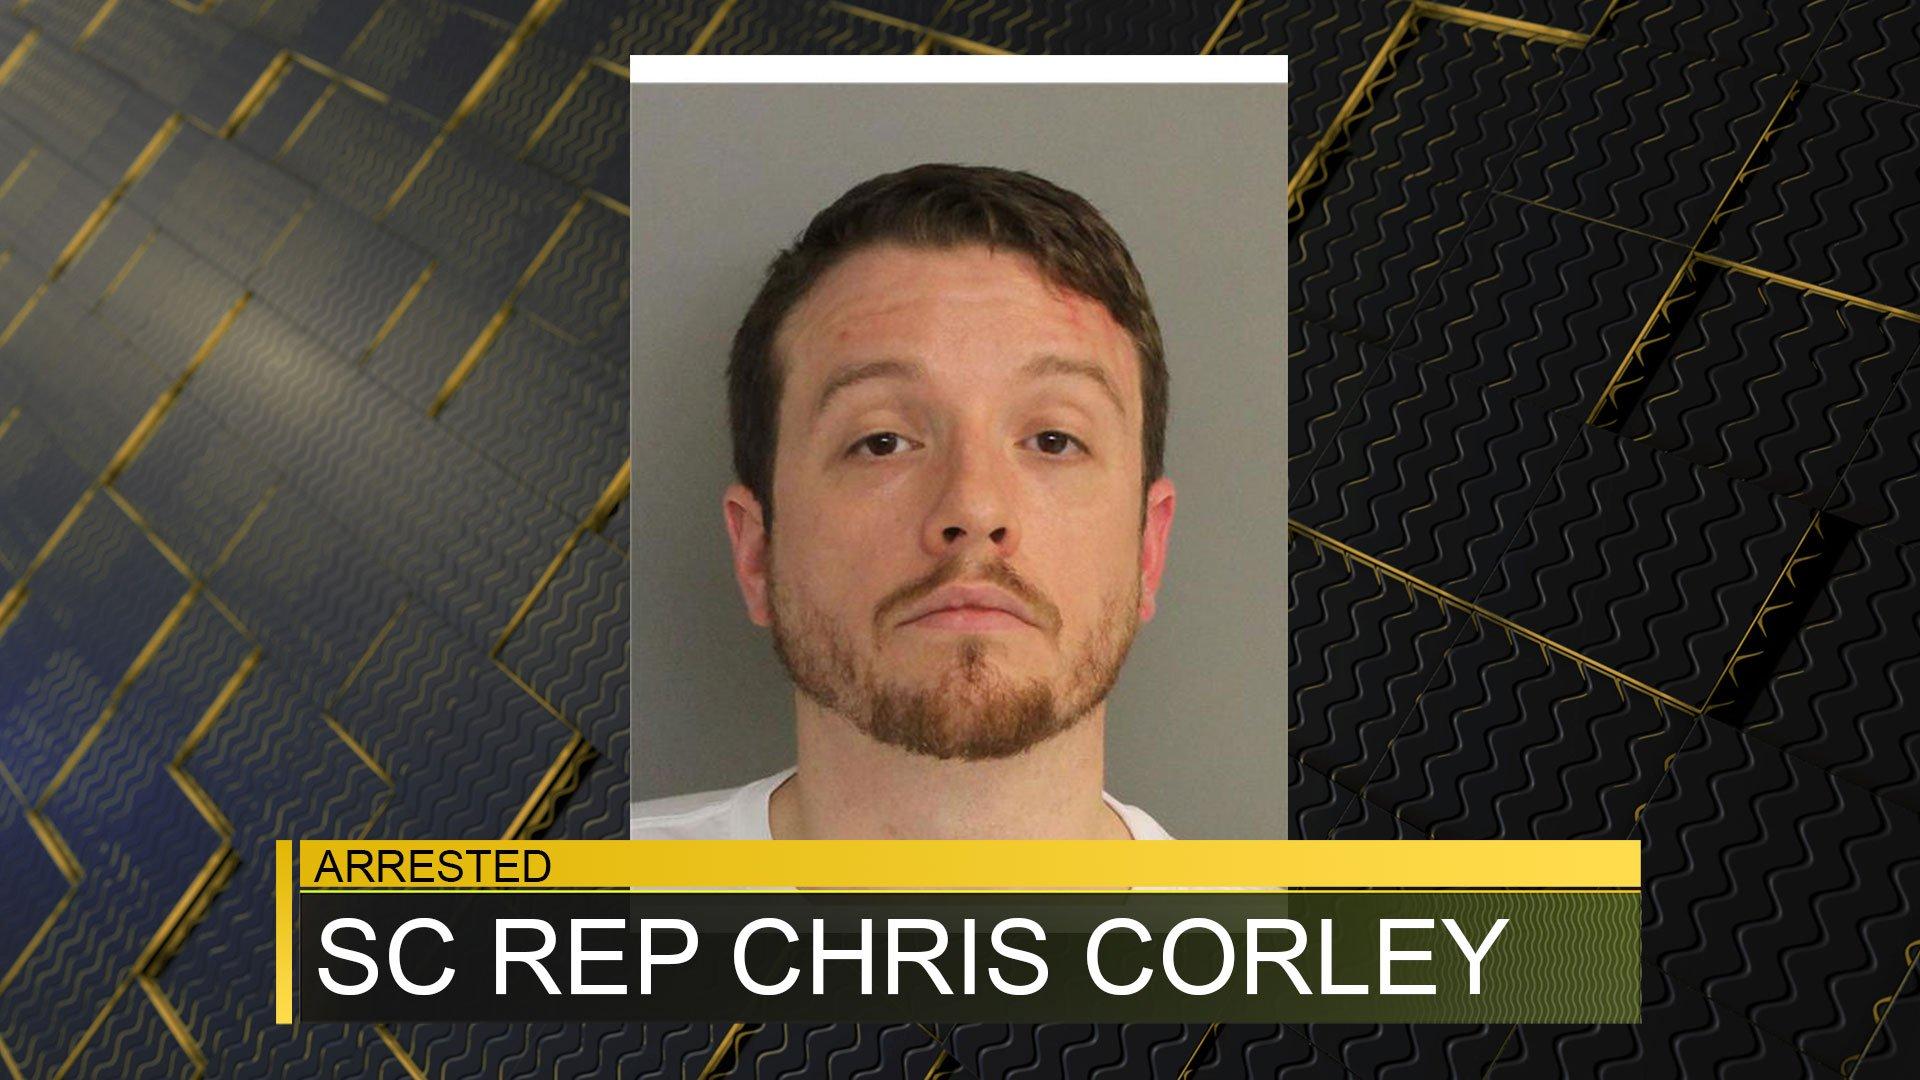 SC Rep. Chris Corley (source: Aiken County Detention Center)